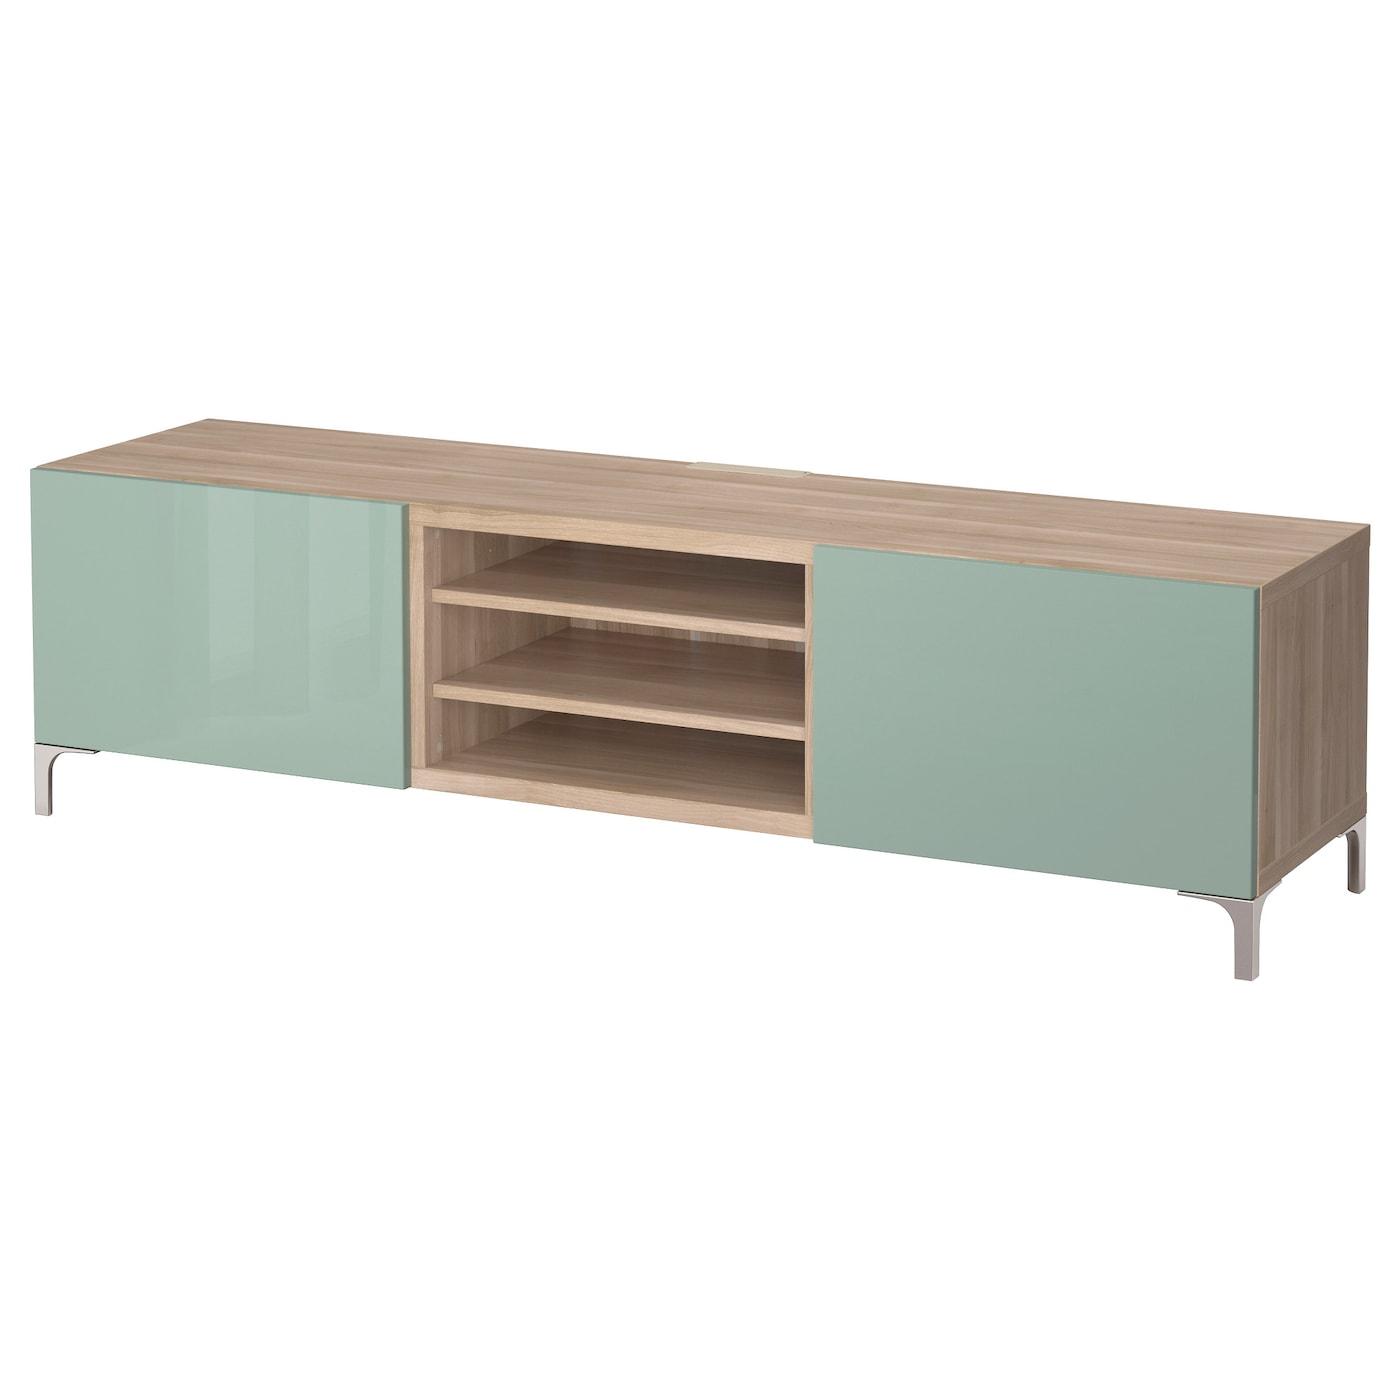 best banc tv avec tiroirs motif noyer teint gris selsviken brillant gris vert clair 180x40x48. Black Bedroom Furniture Sets. Home Design Ideas